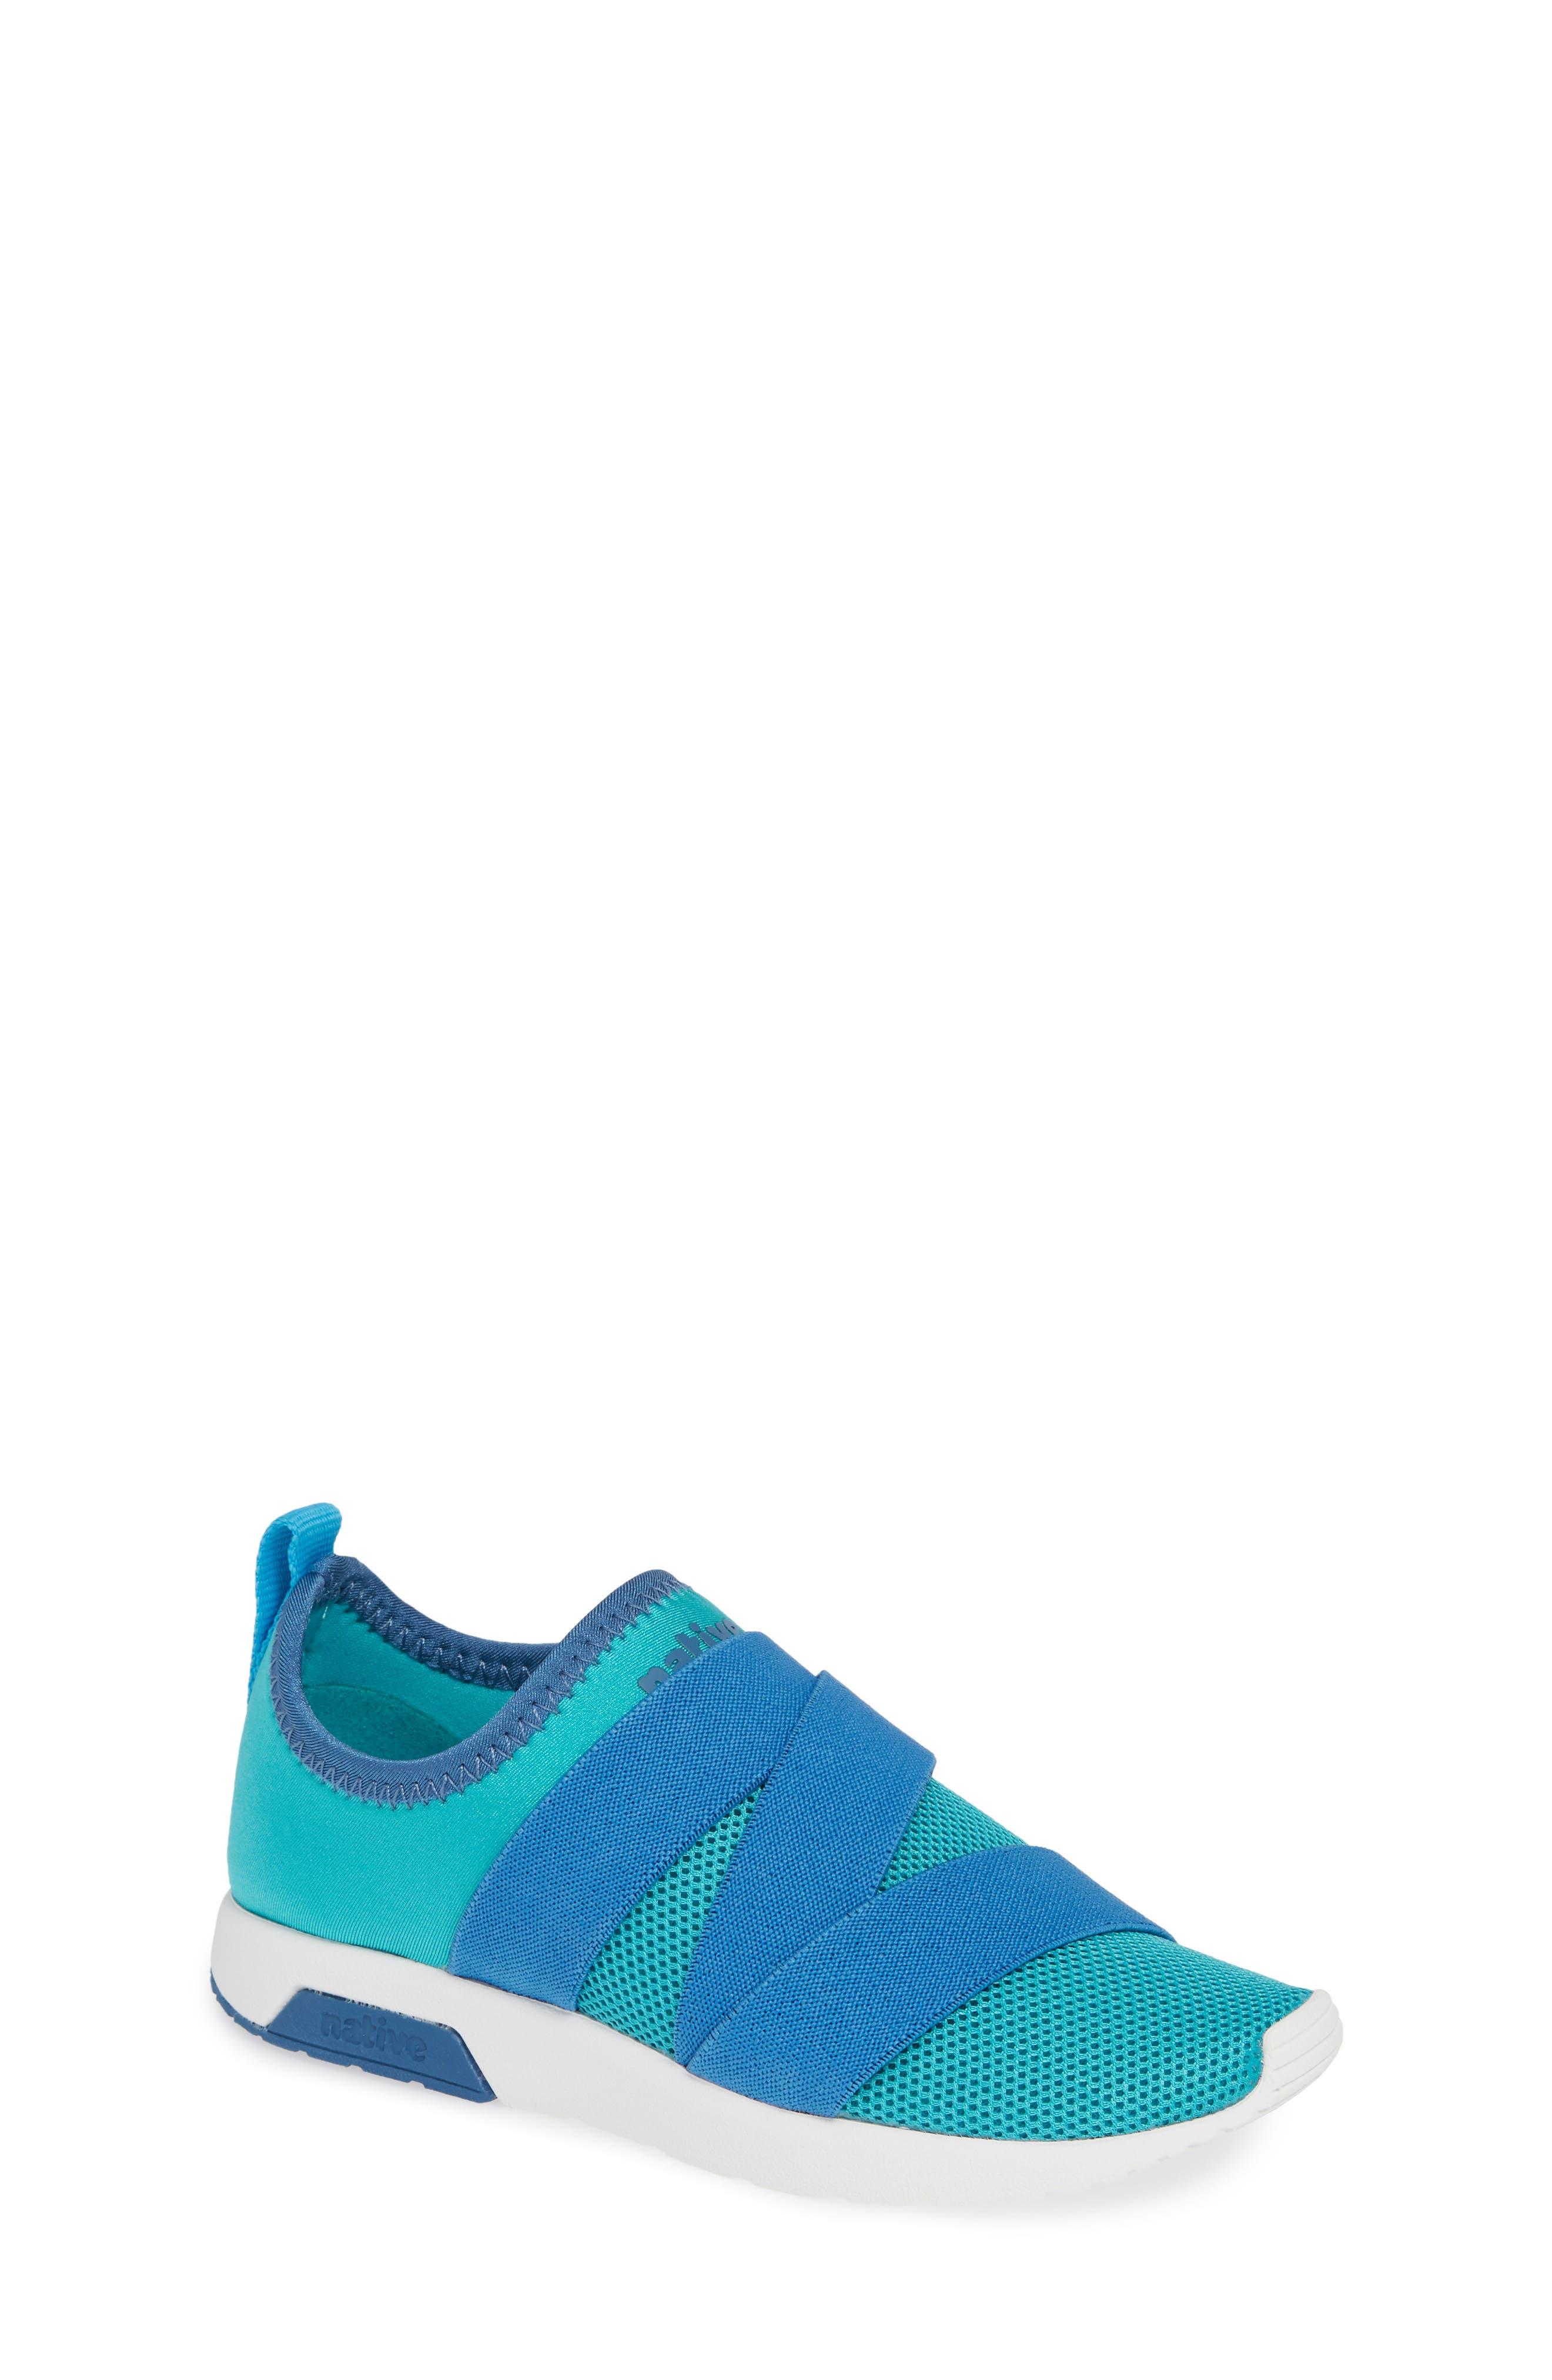 NATIVE SHOES,                             Phoenix Slip-On Vegan Sneaker,                             Main thumbnail 1, color,                             GLACIER GREEN/ BLUE/ WHITE